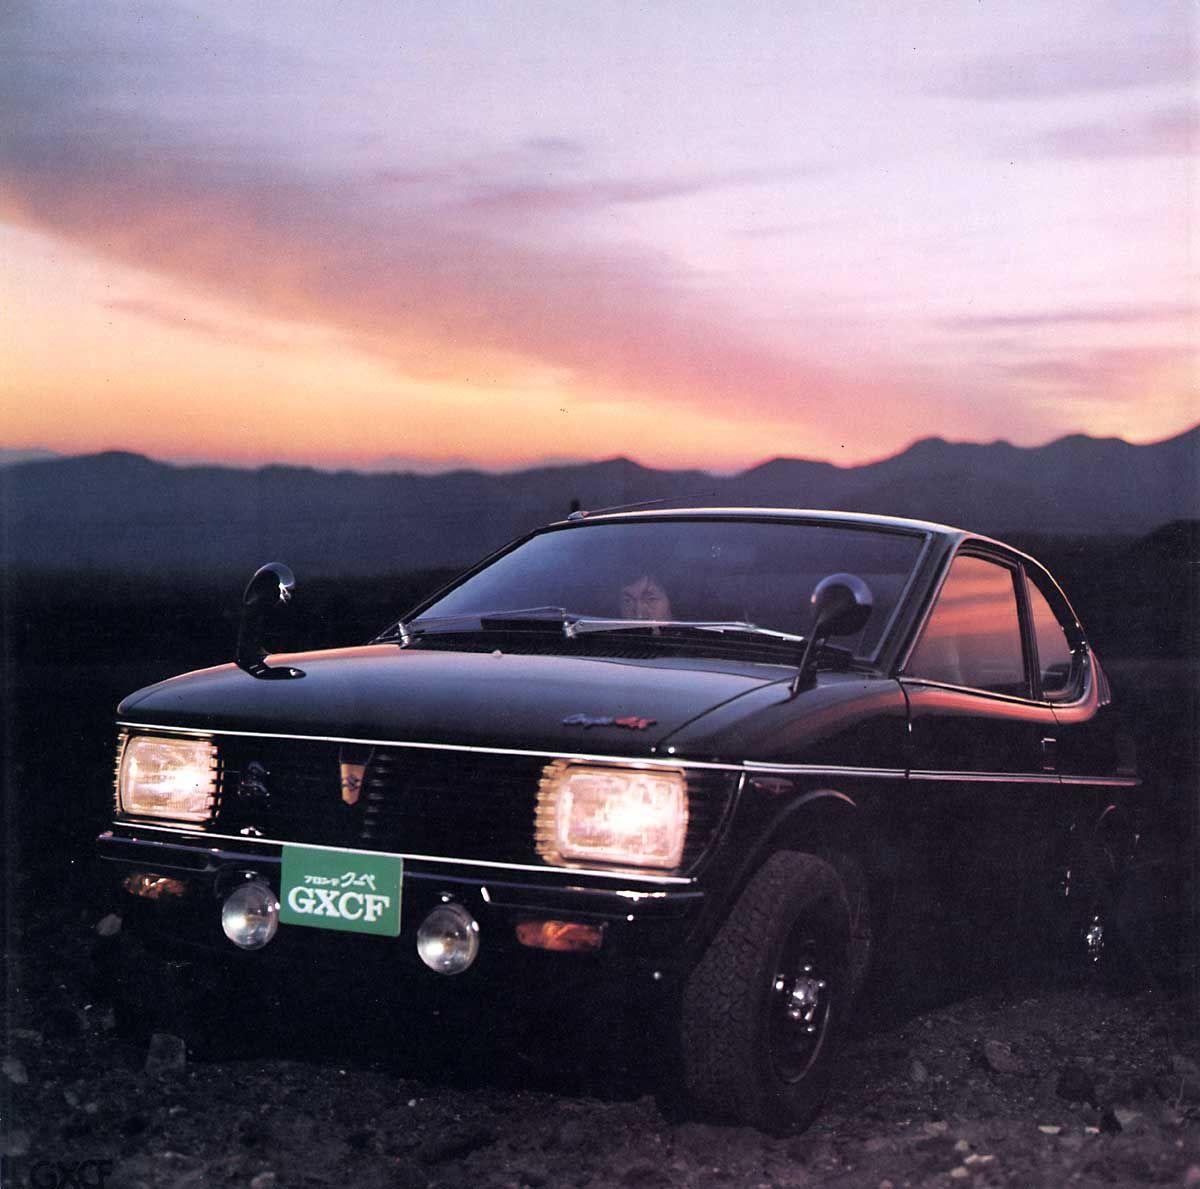 Suzuki cervo ss20 classic cars pinterest car stuff coupe and cars